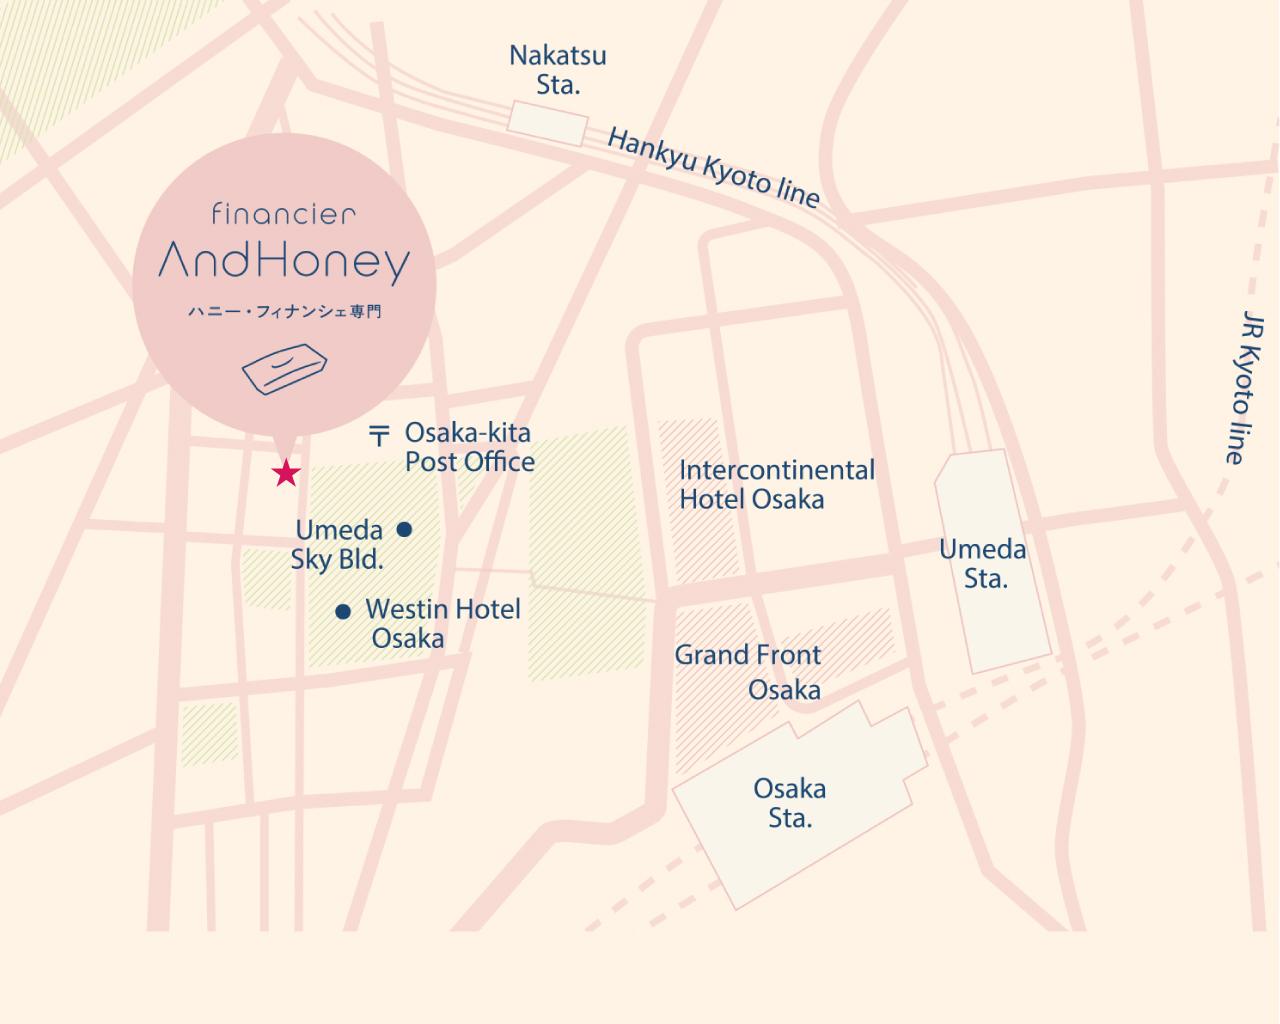 AndHoney